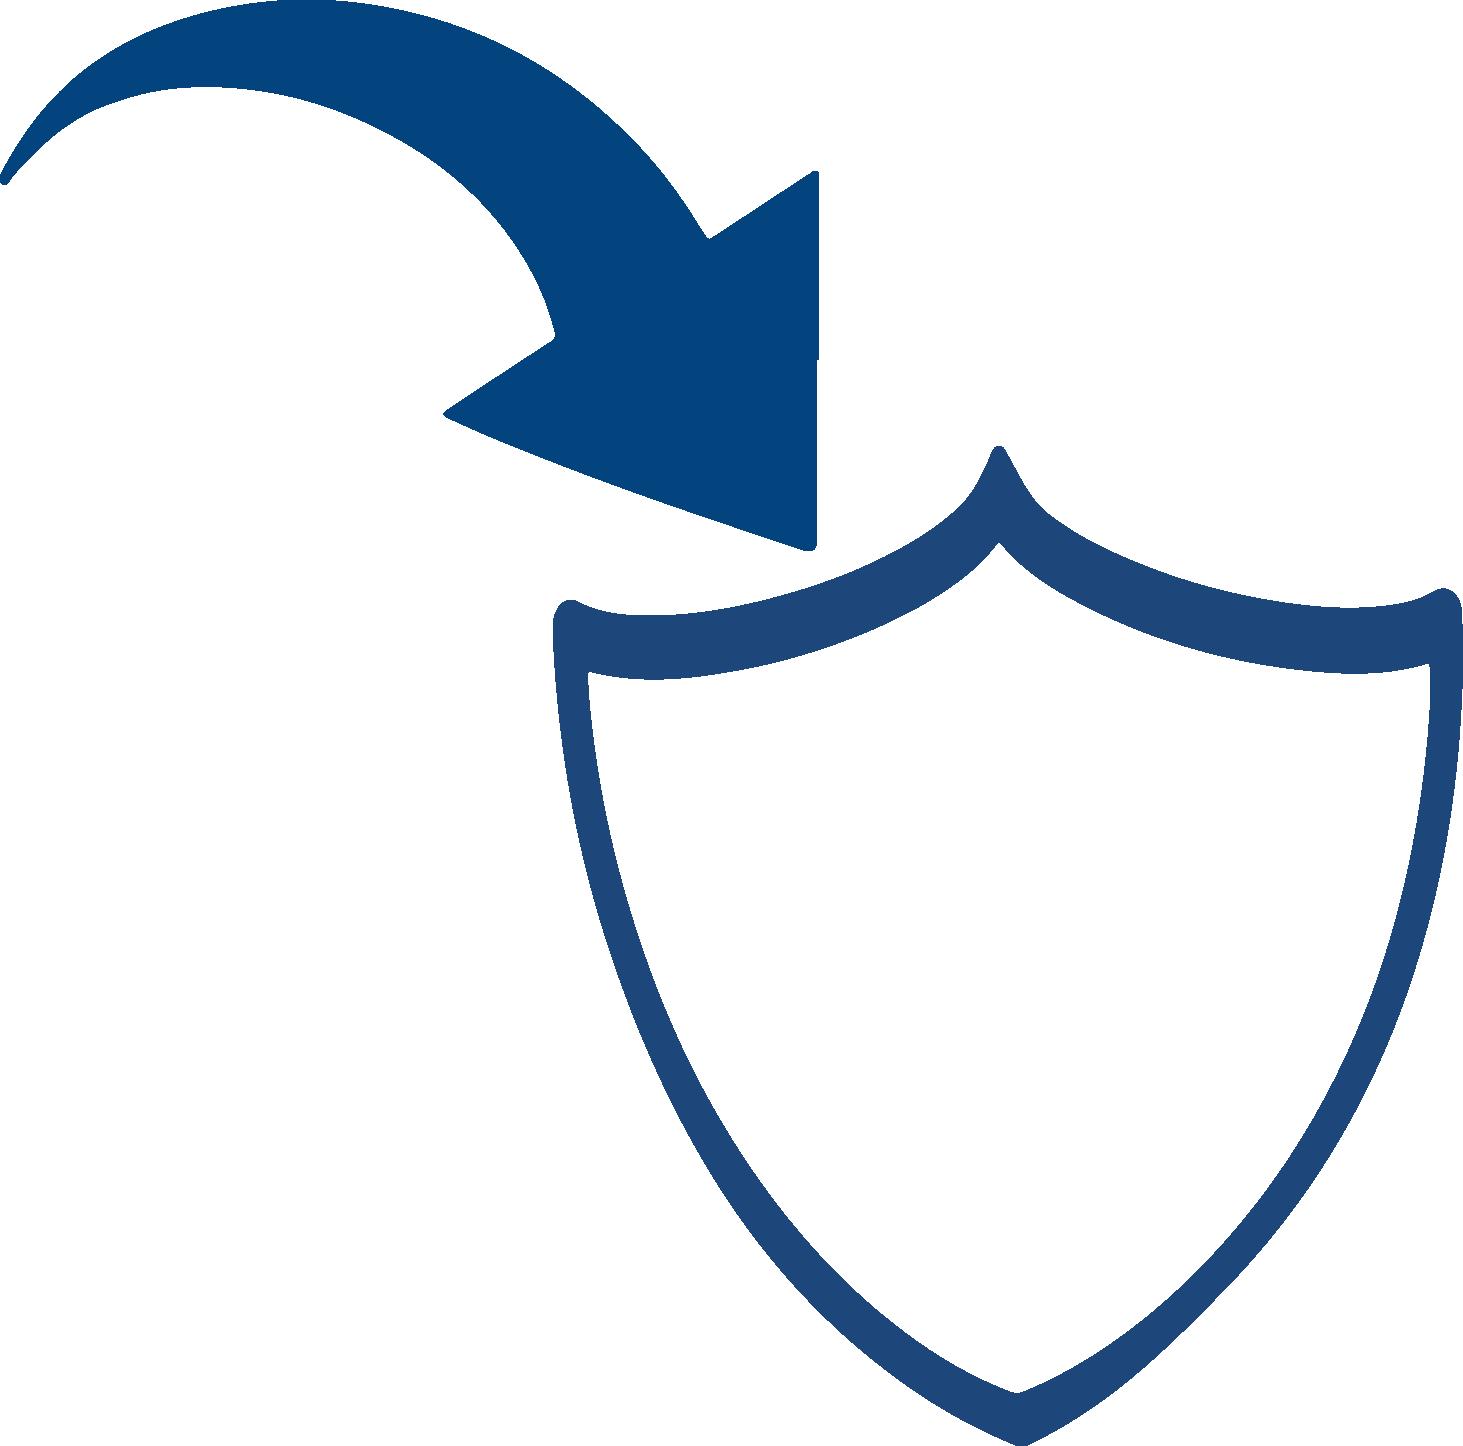 Security purposes icon